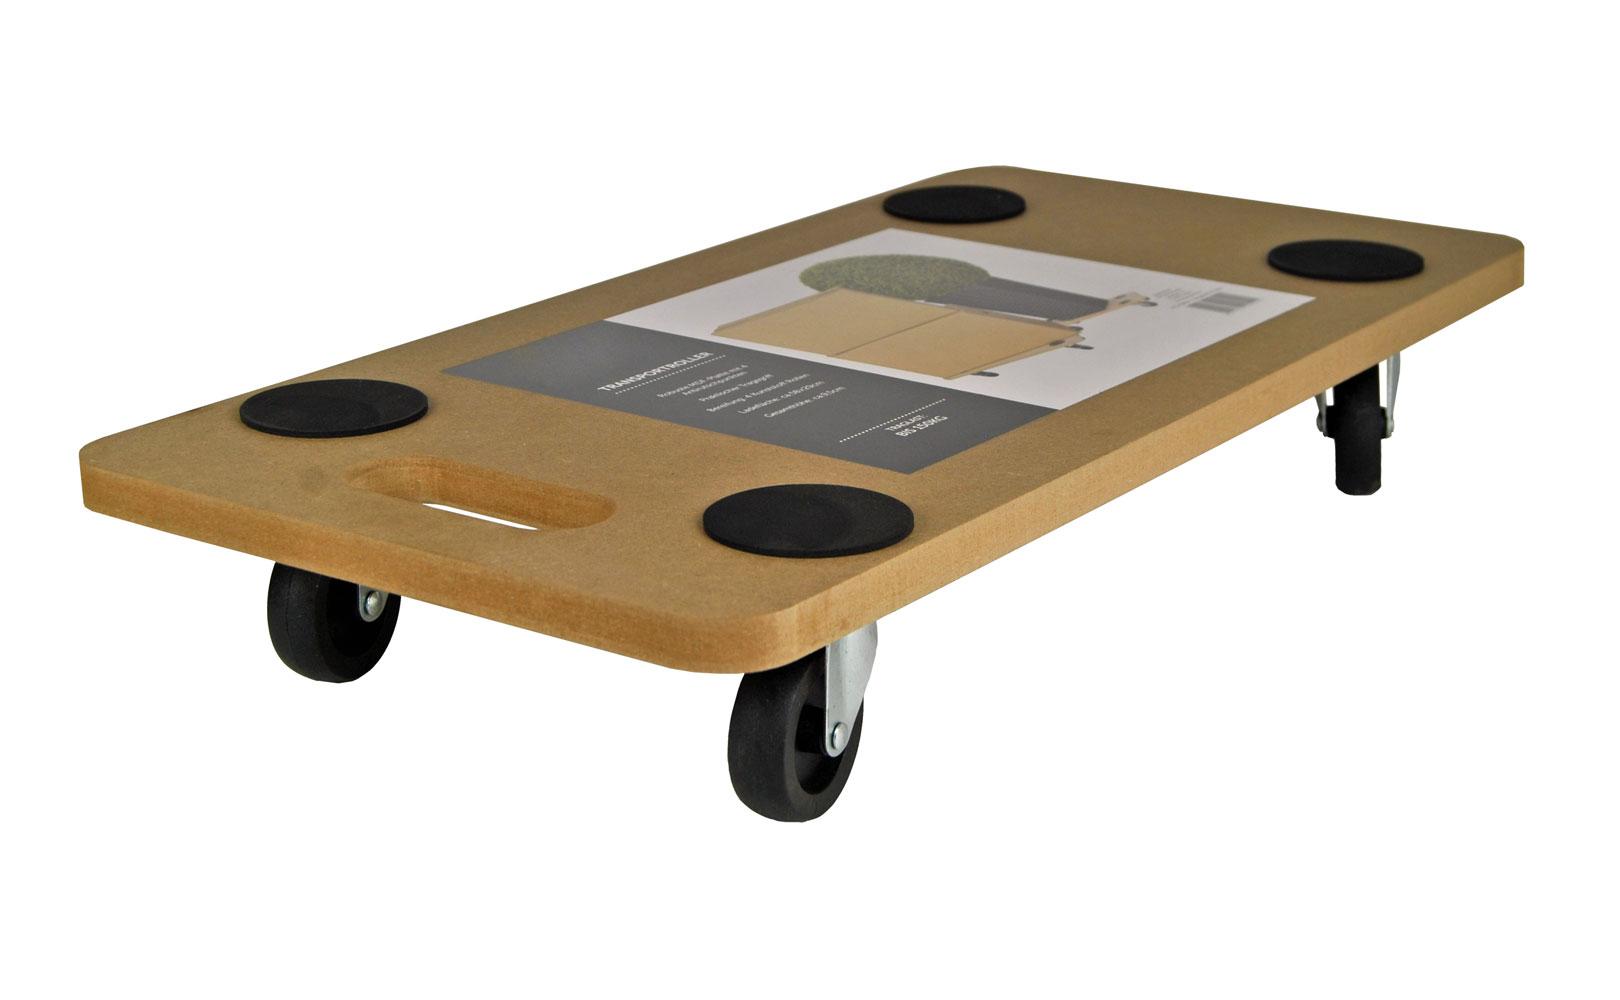 transportroller mit antirutschpunkten 58x29 rollbrett transportbrett m belroller 4057984005541. Black Bedroom Furniture Sets. Home Design Ideas